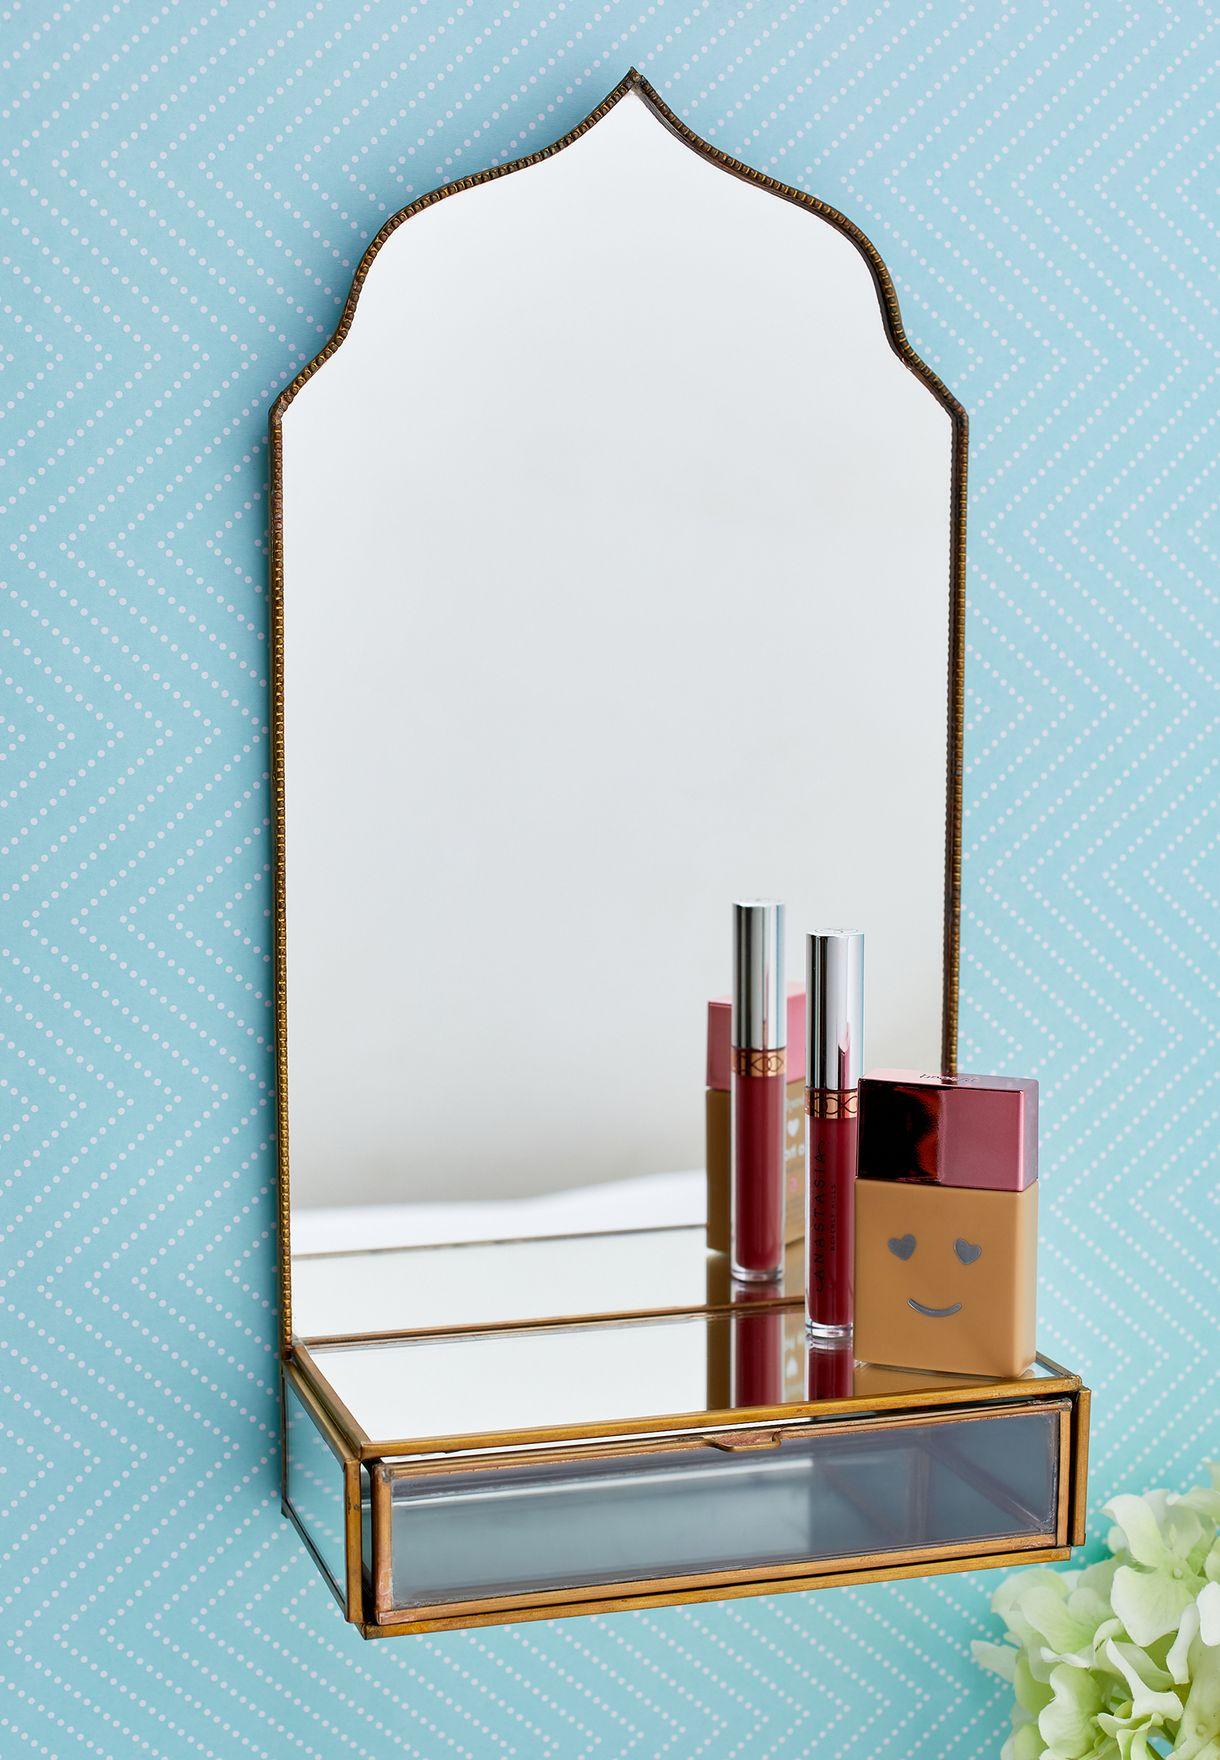 Small Taj Mirror With Drawer